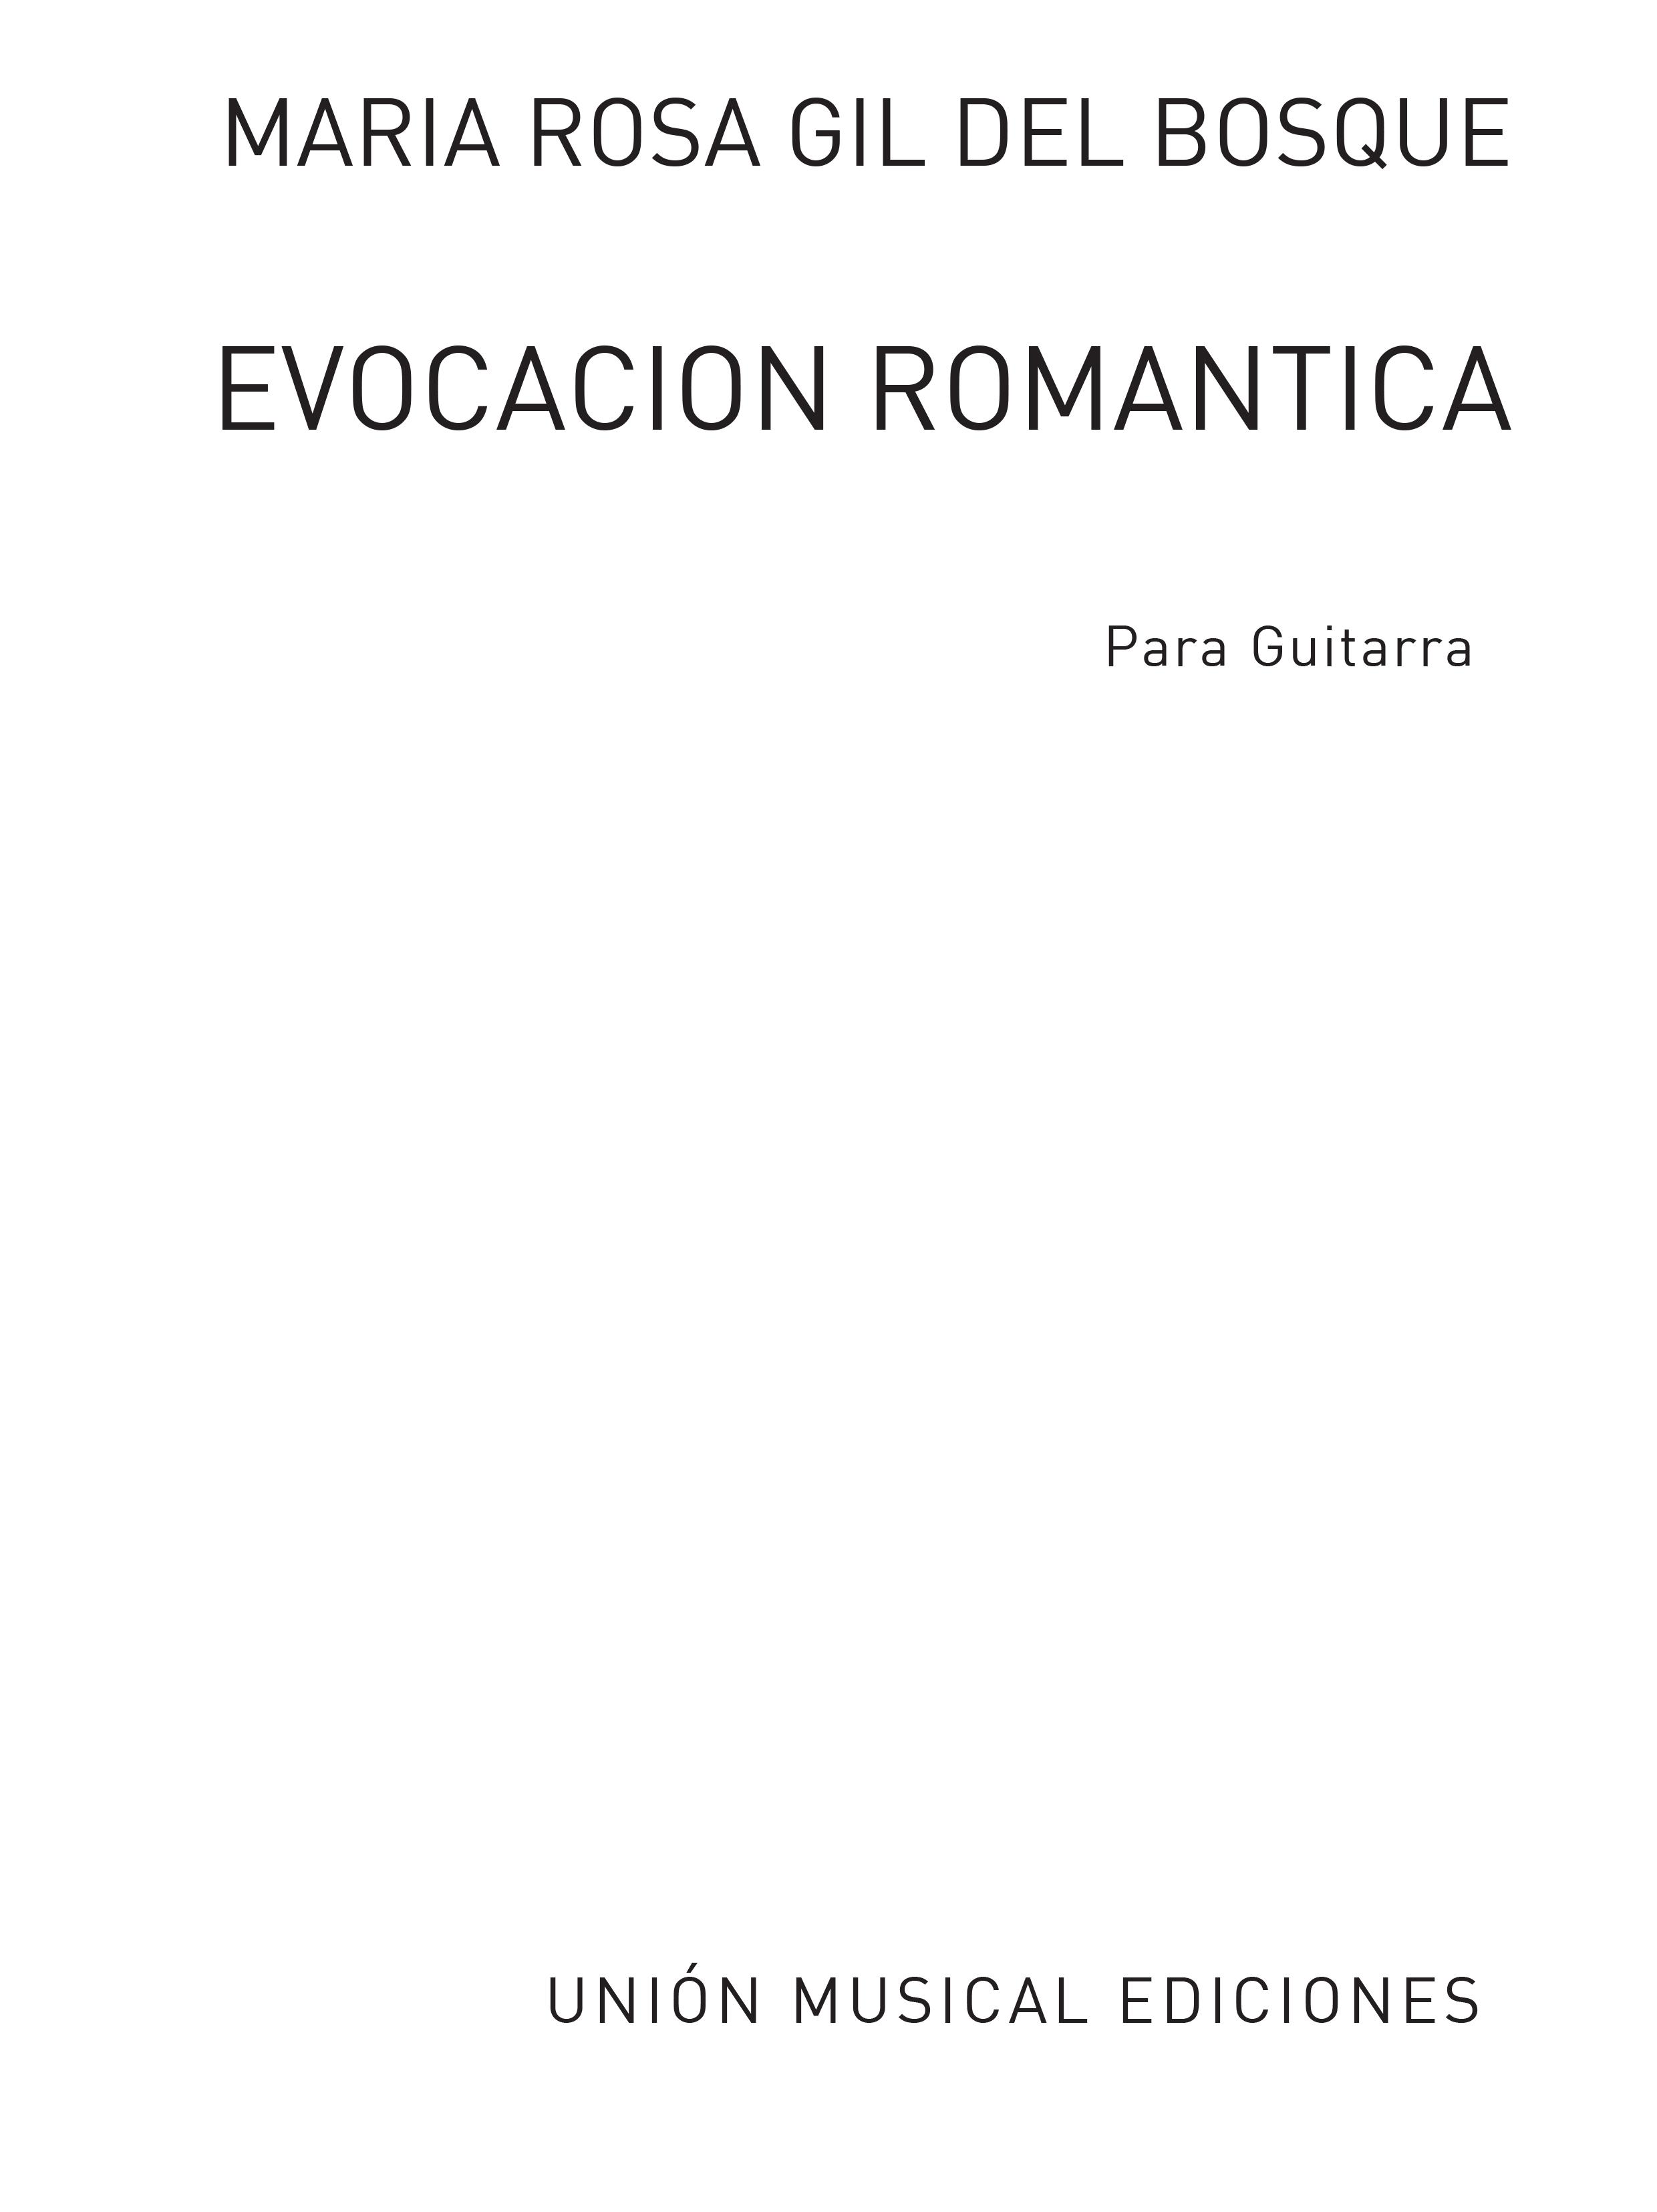 Rosa Gil Del Bosque: Evocacion Romantica: Guitar: Instrumental Work